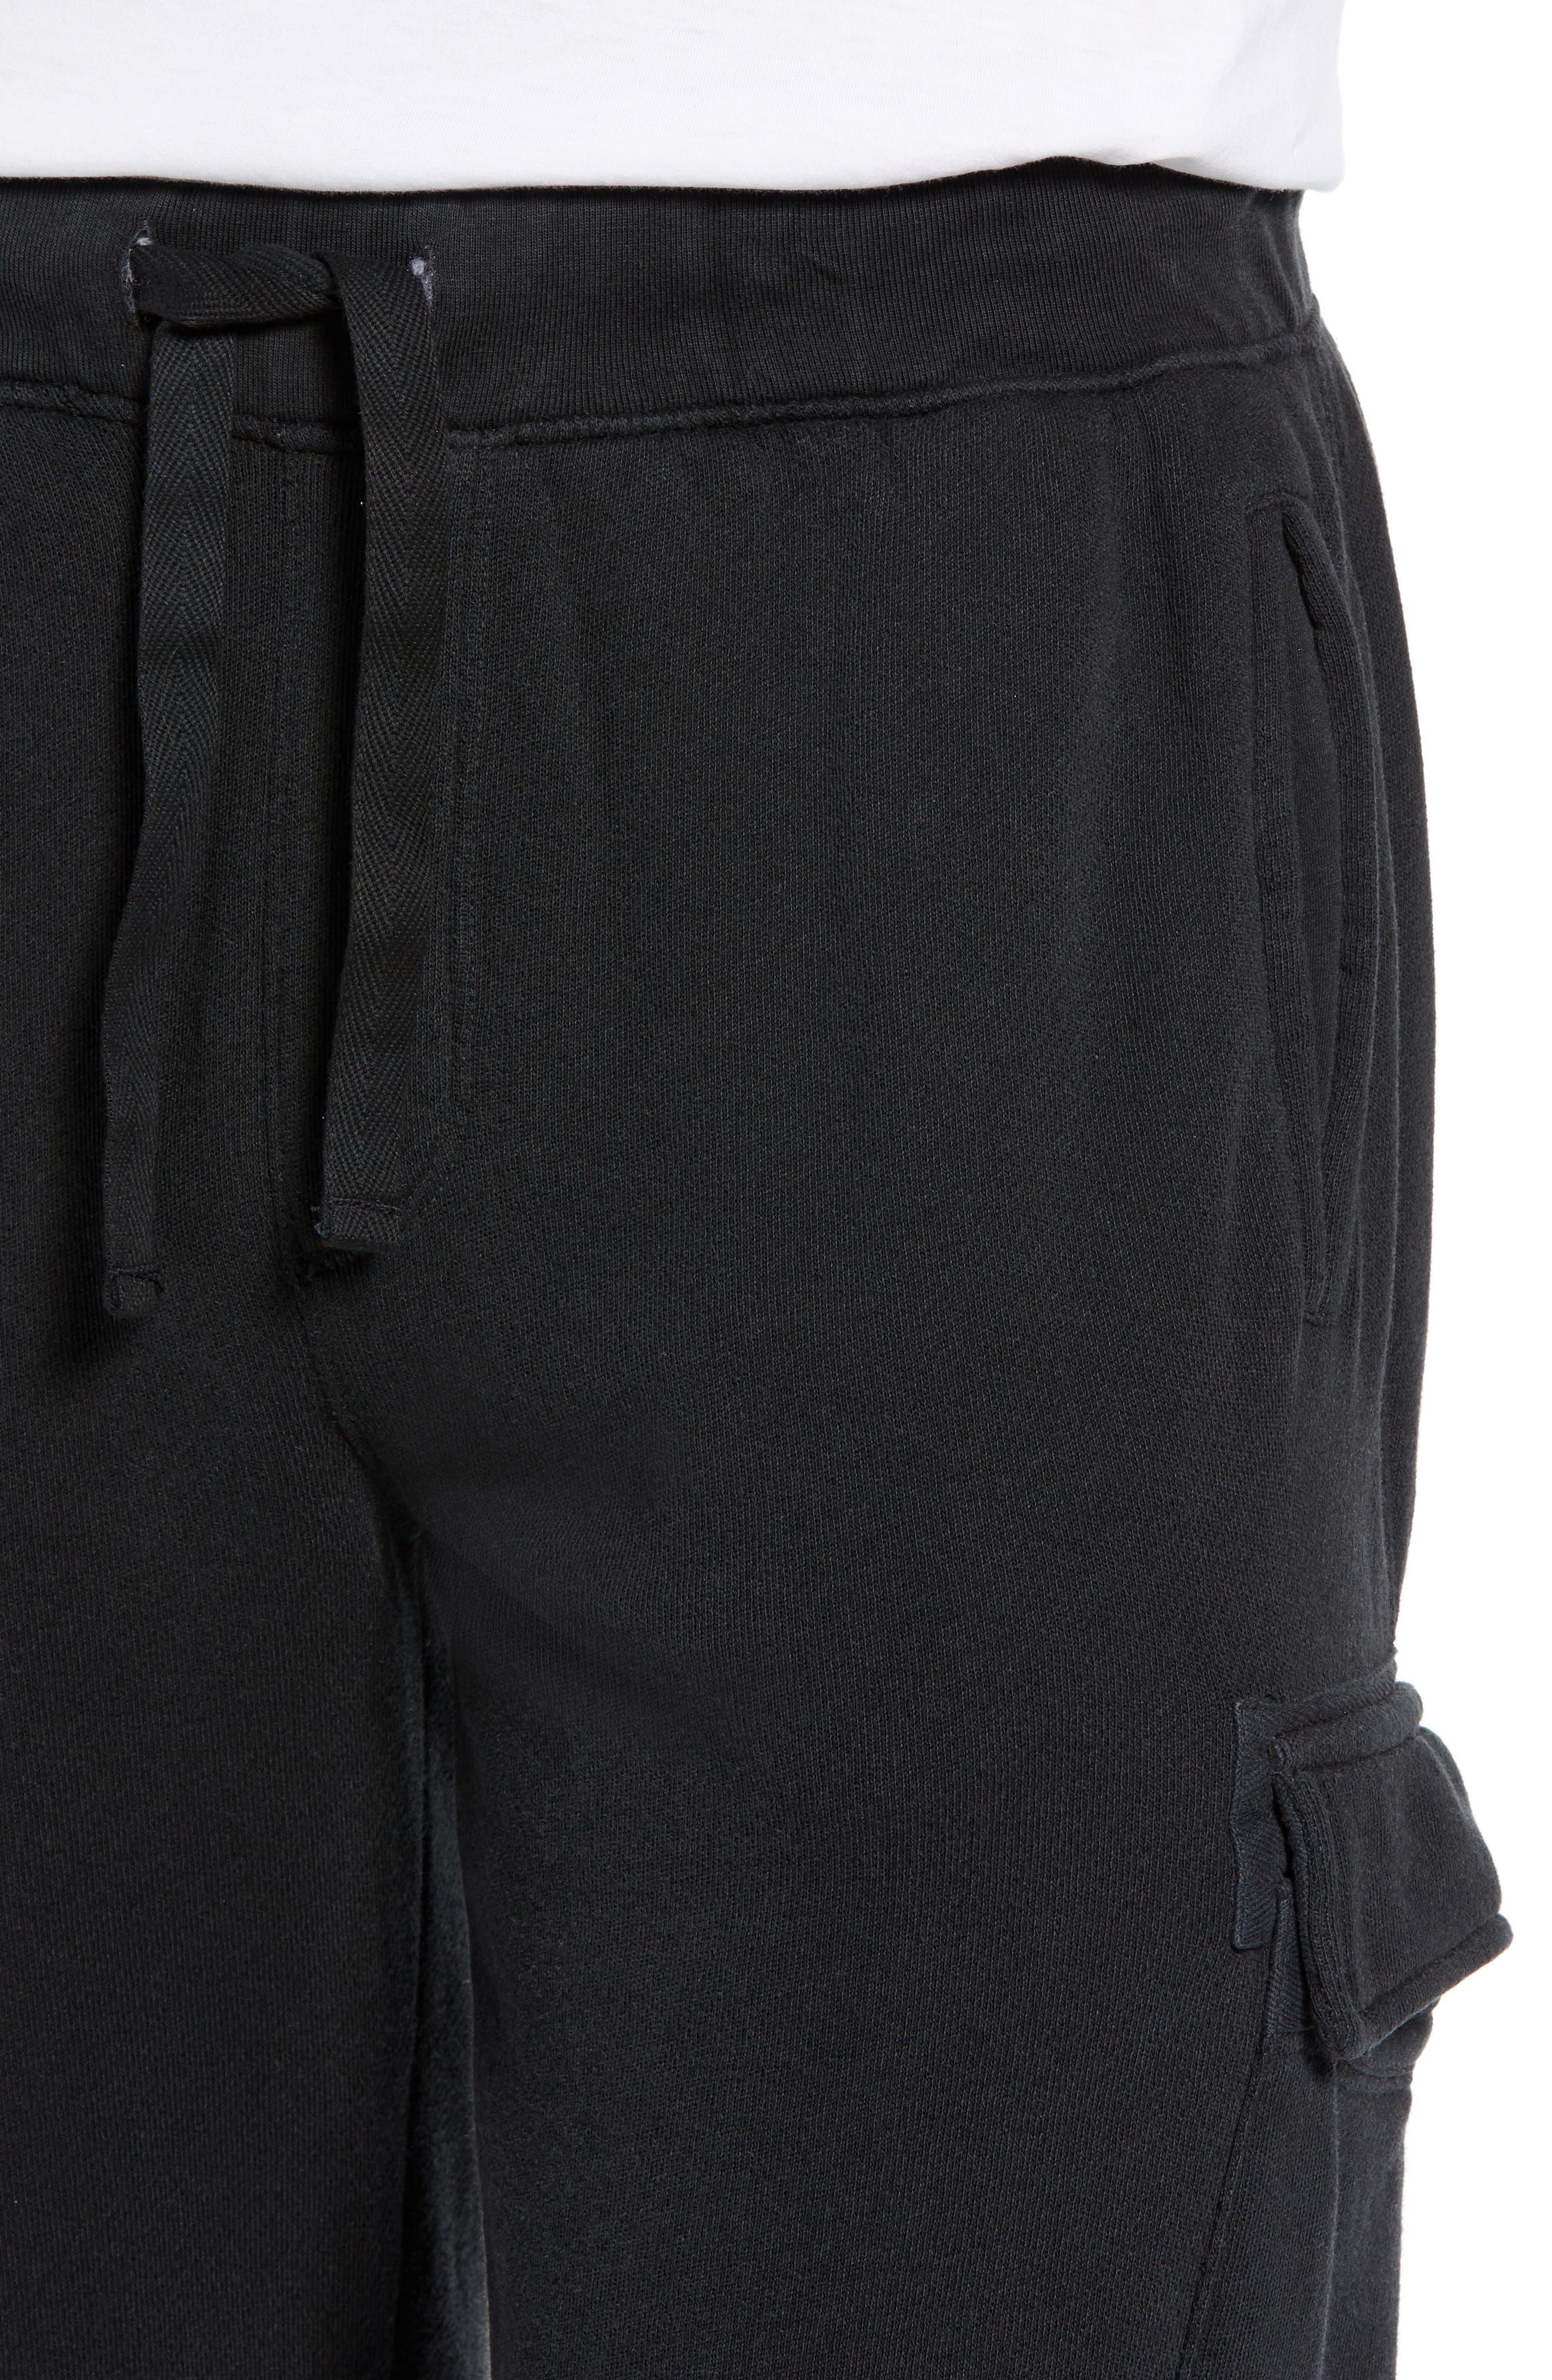 Slim Fit Sweatpants,                             Alternate thumbnail 4, color,                             CHARCOAL